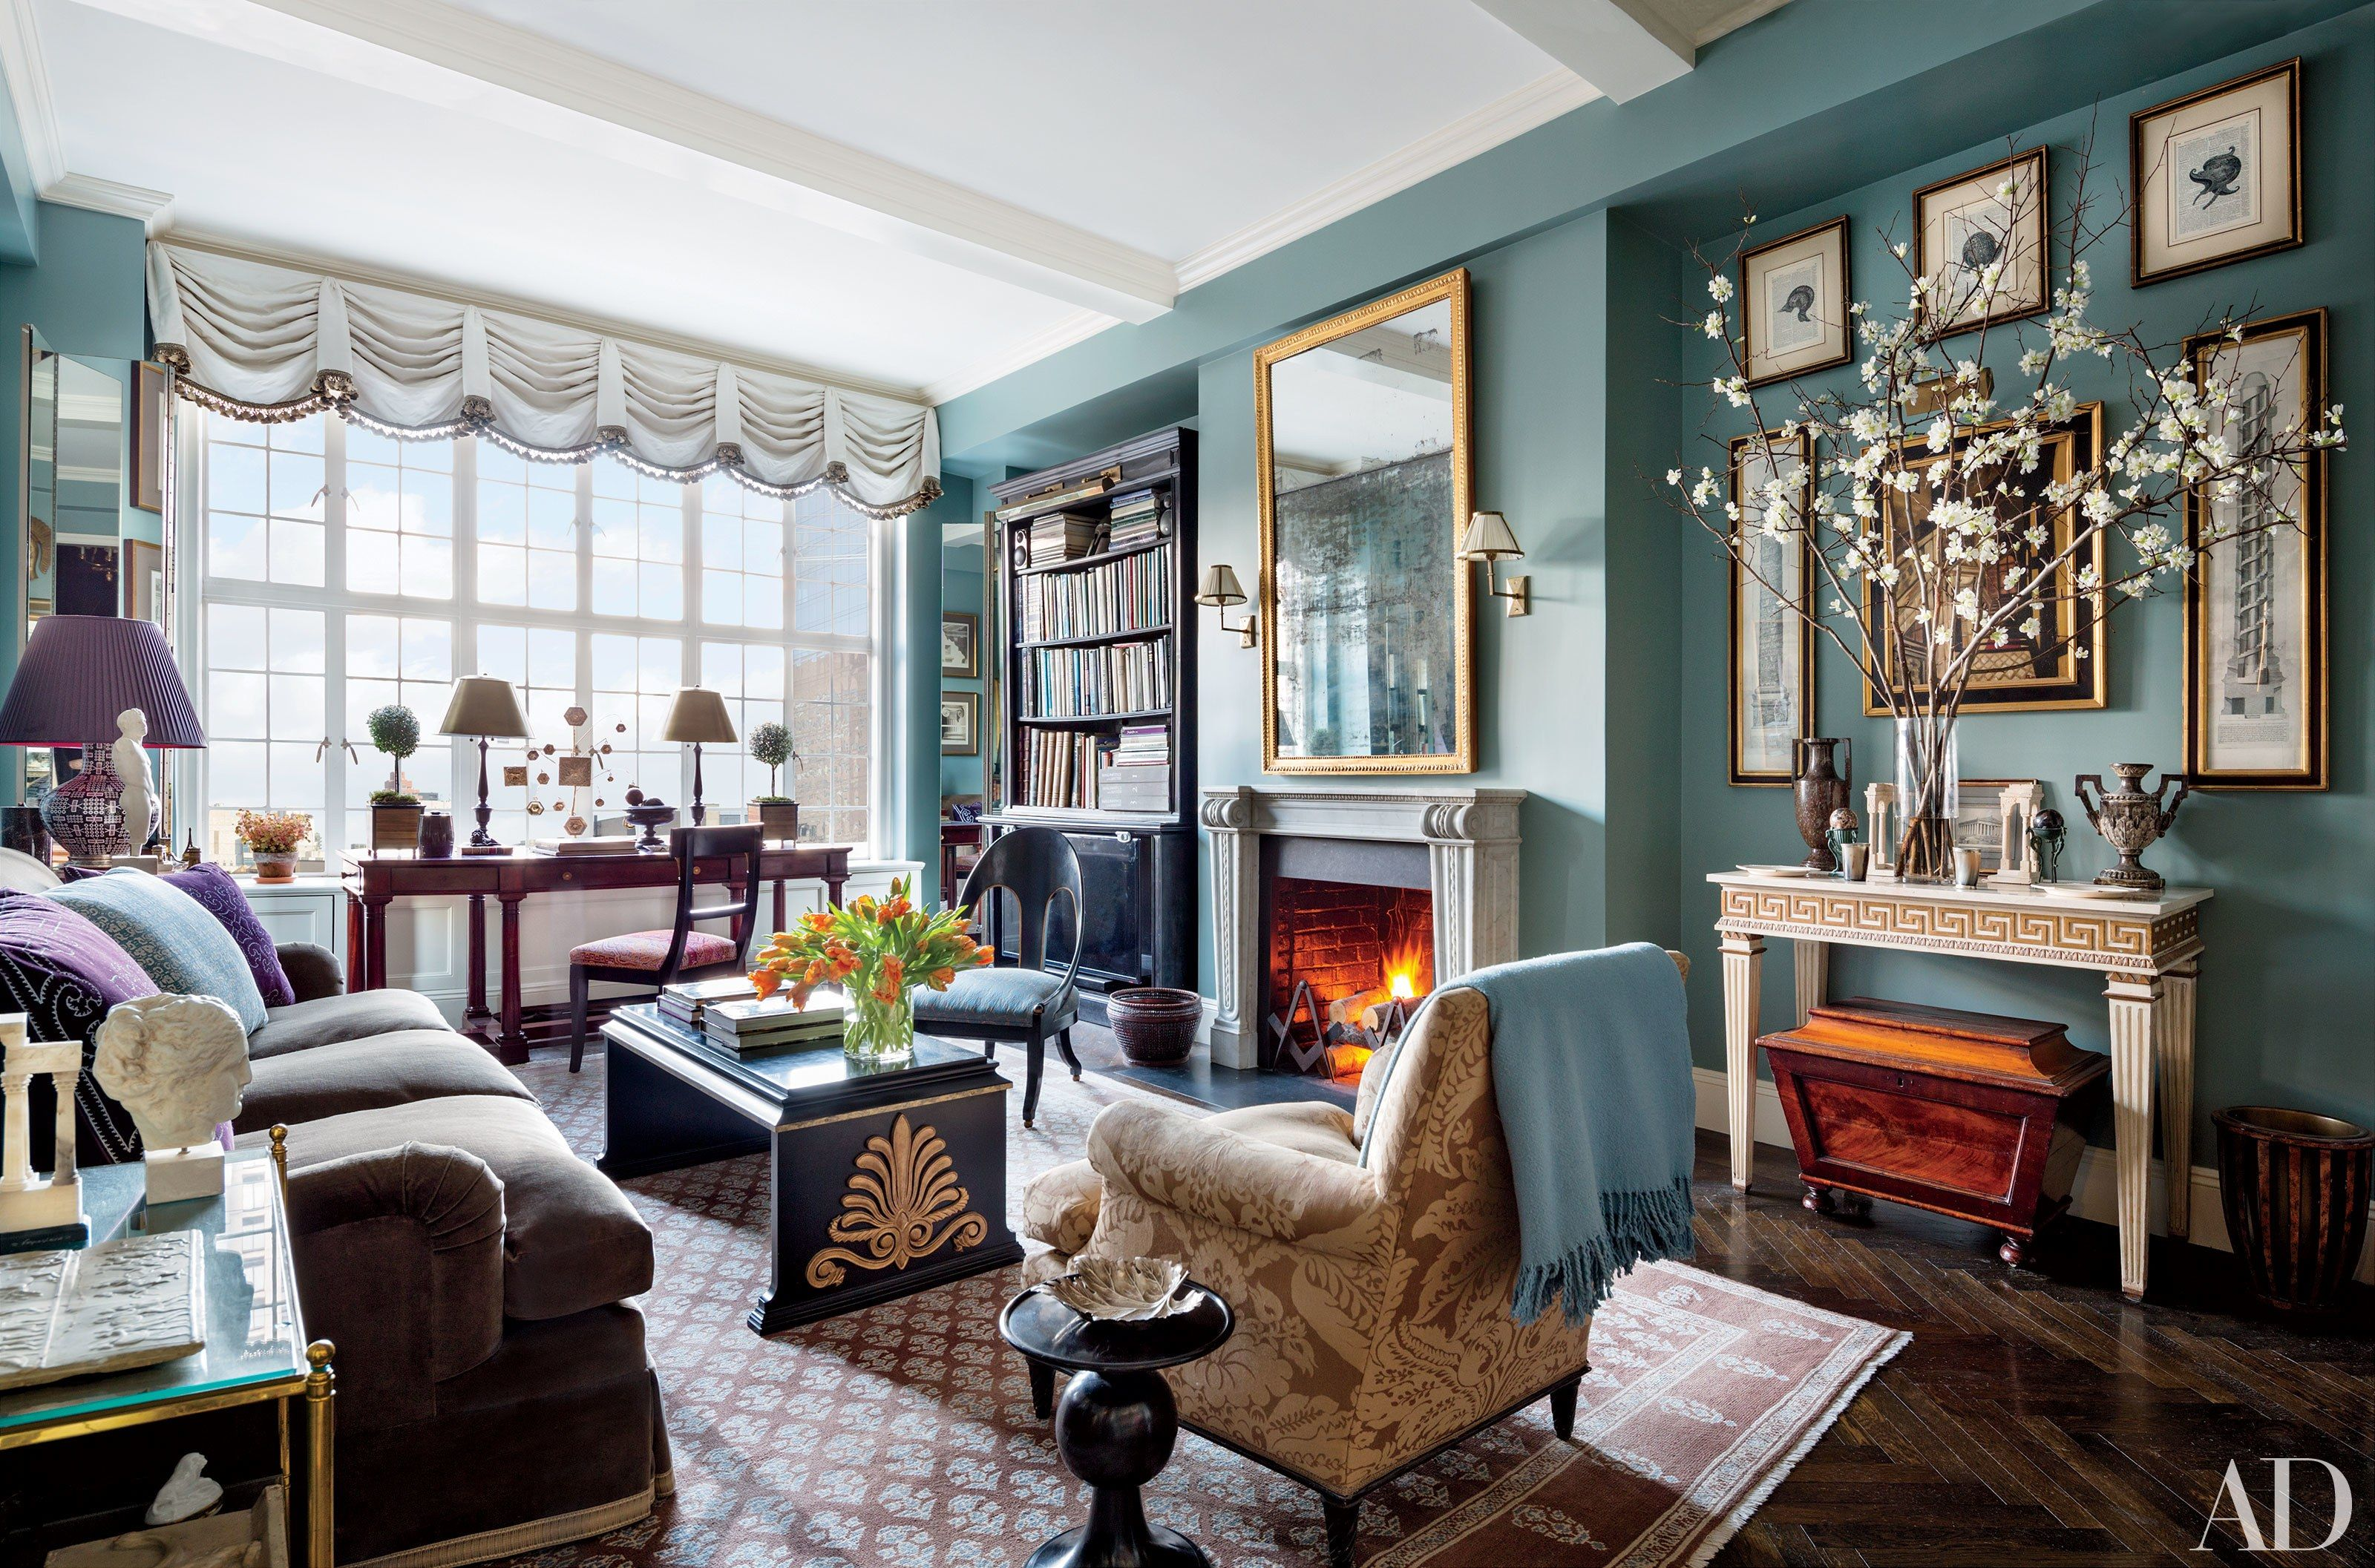 6 classic rooms by alexa hampton head of design firm mark hampton